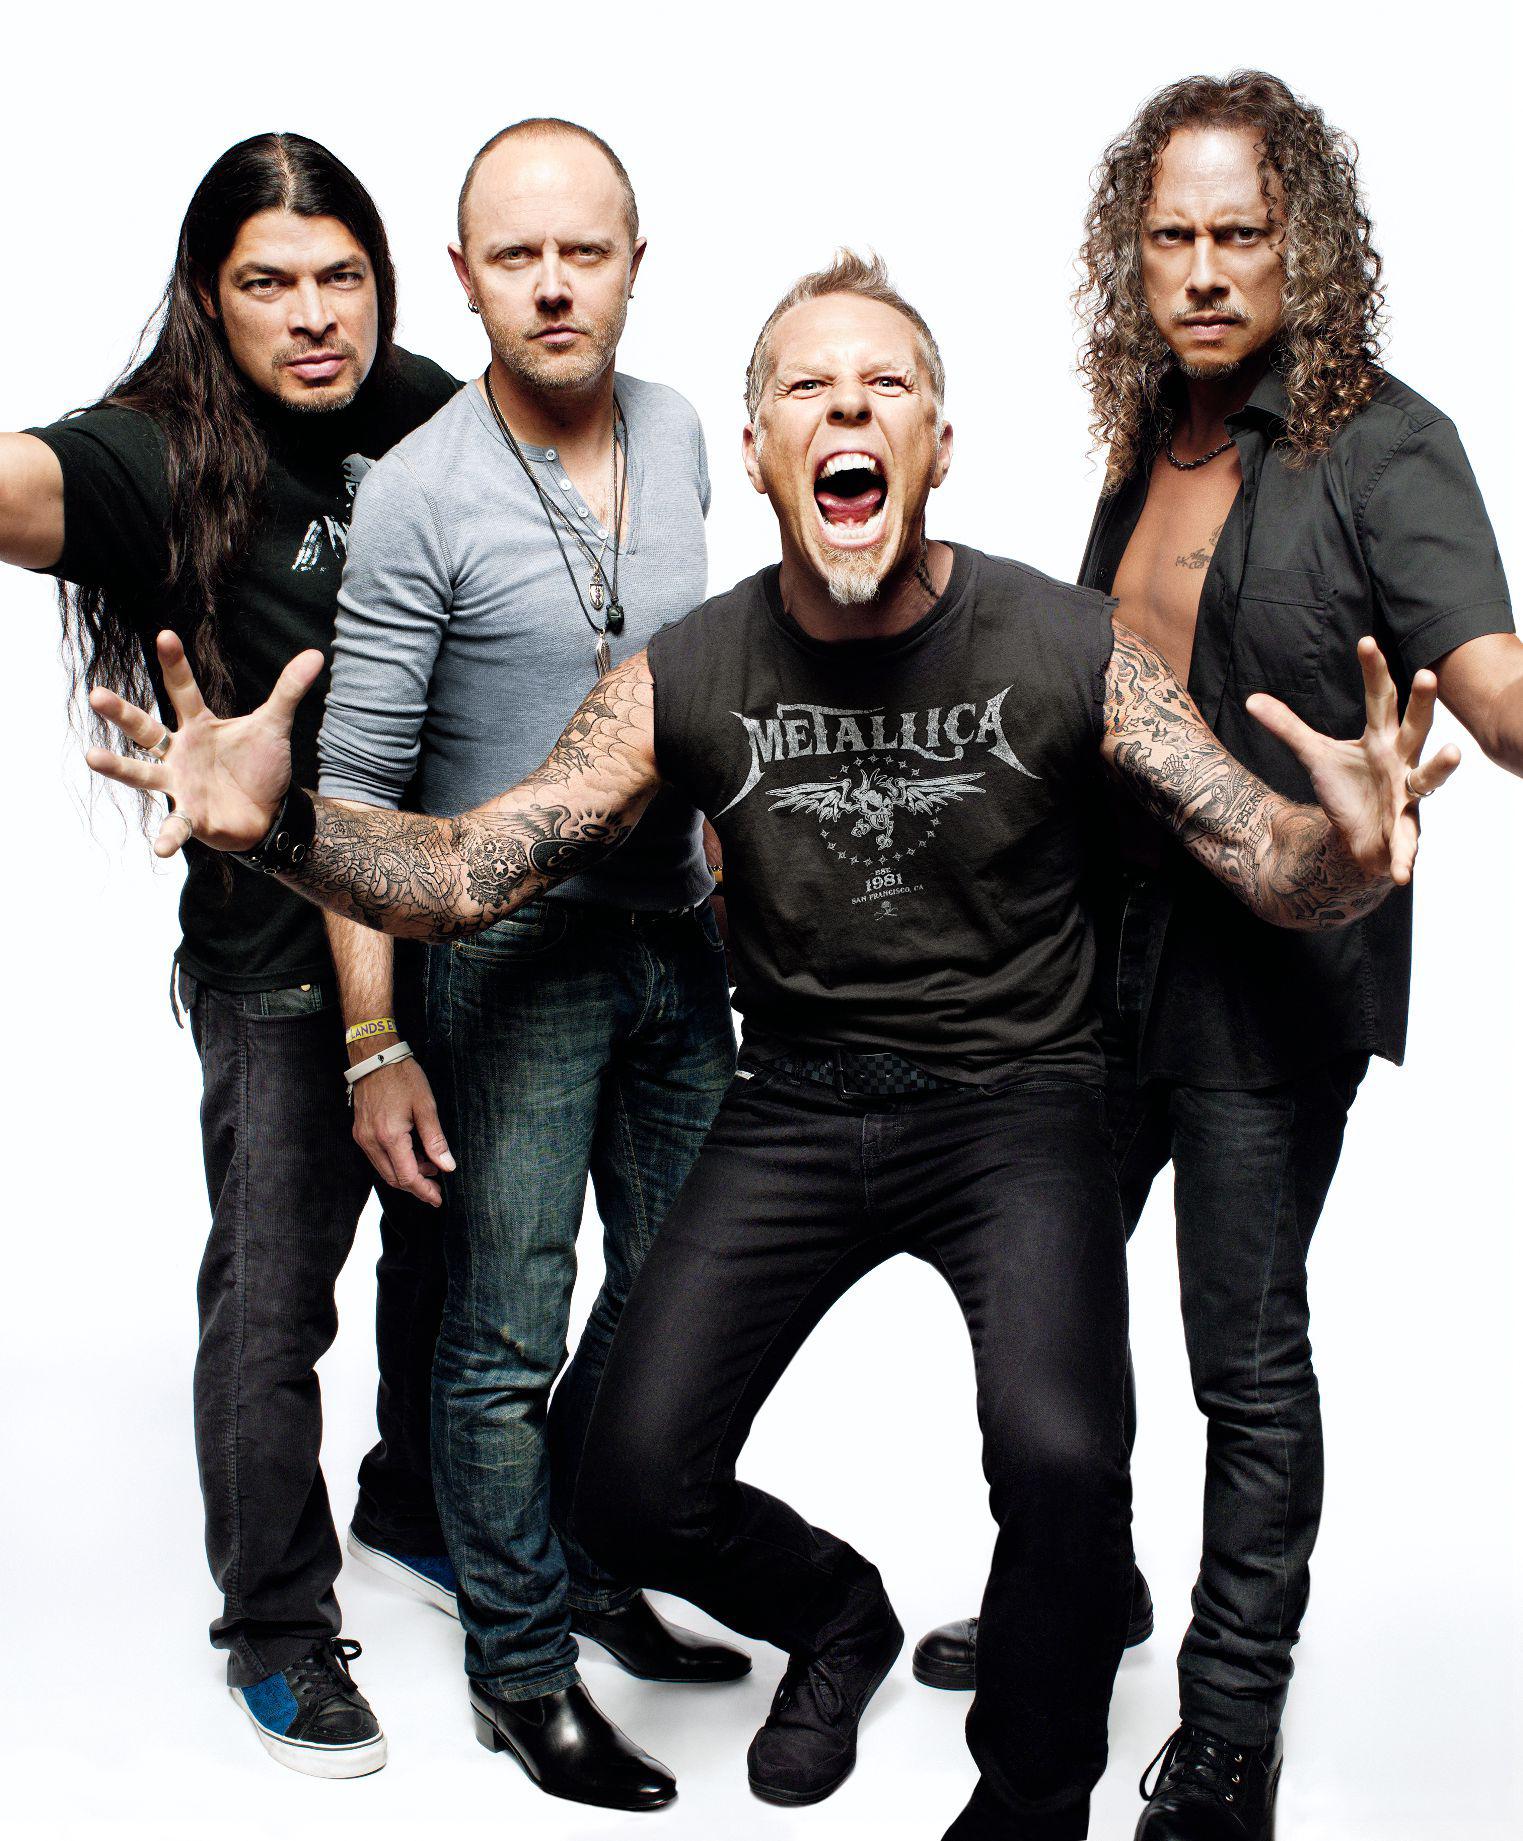 Metallica - Metallica Photo (31189793) - Fanpop